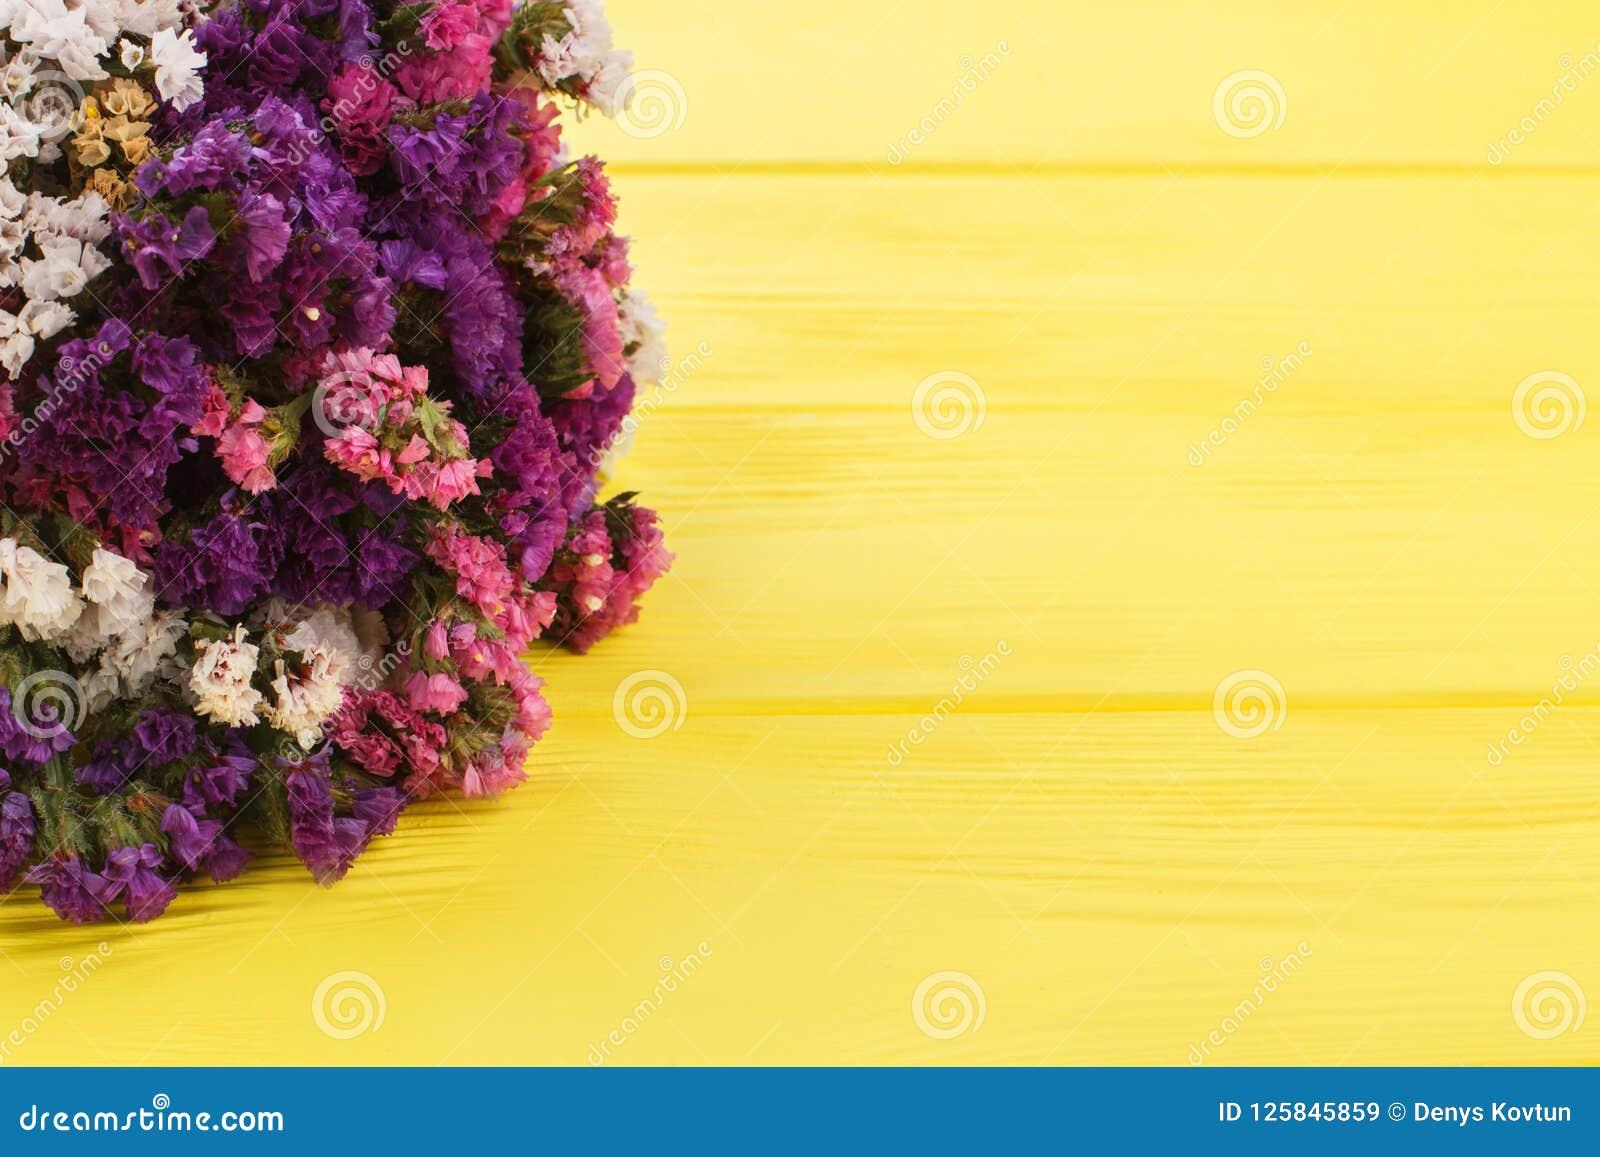 Limonium statice flowers on yellow wood background stock image limonium statice flowers on yellow wood background mightylinksfo